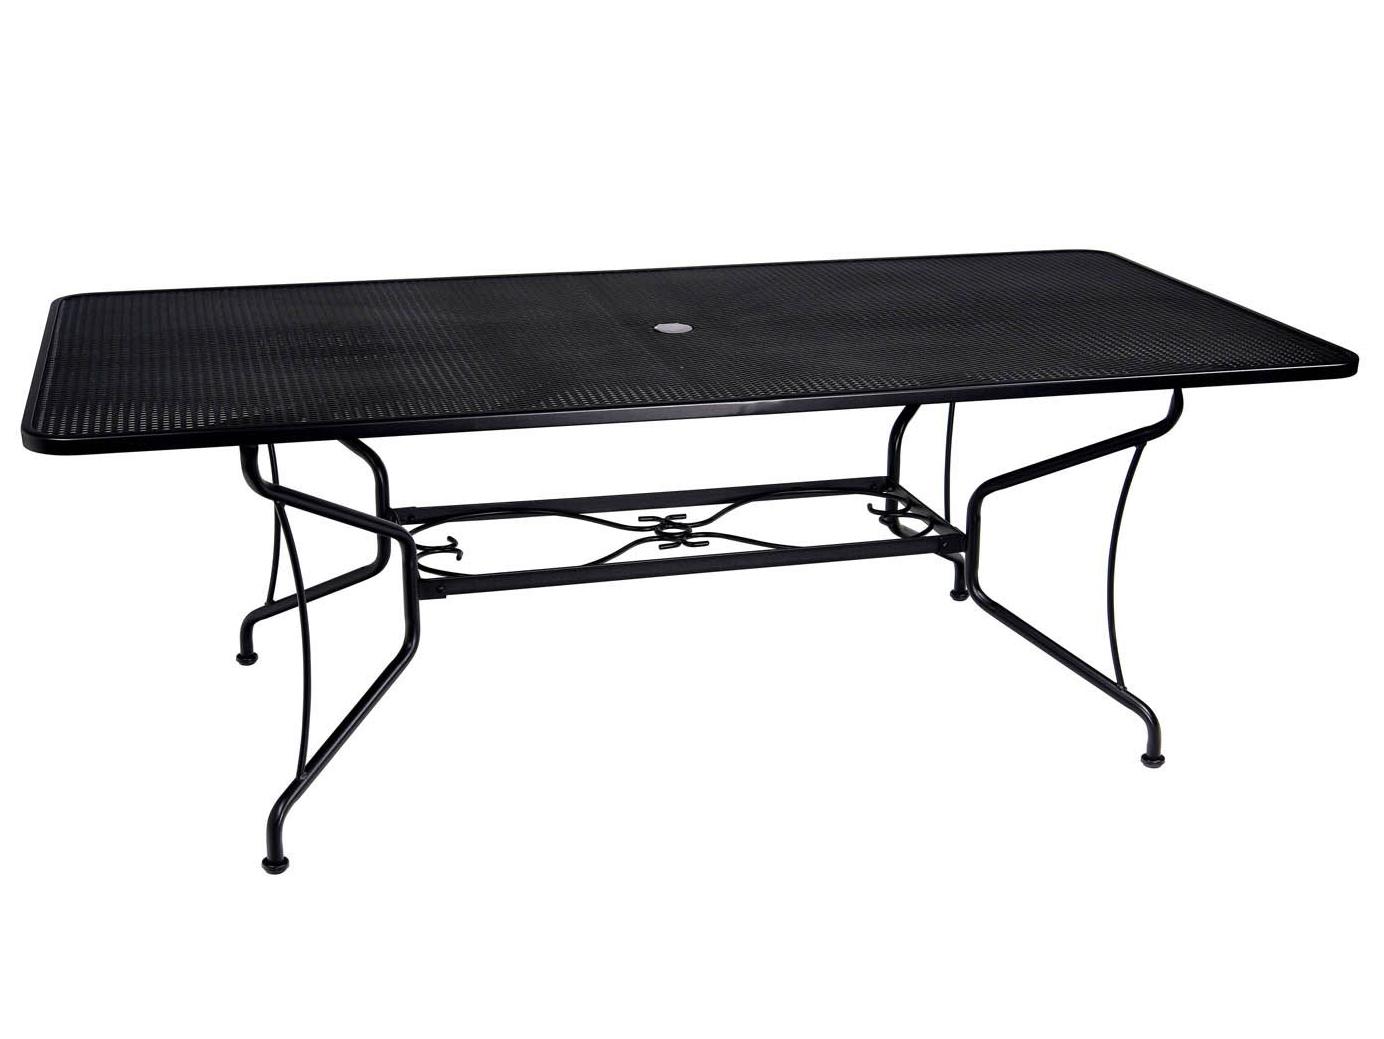 Smashing Hover To Zoom Woodard Wrought Iron X Rectangular Spoke Table Sale Wrought Iron Table Brackets Umbrella Wrought Iron Table Base houzz-02 Wrought Iron Table